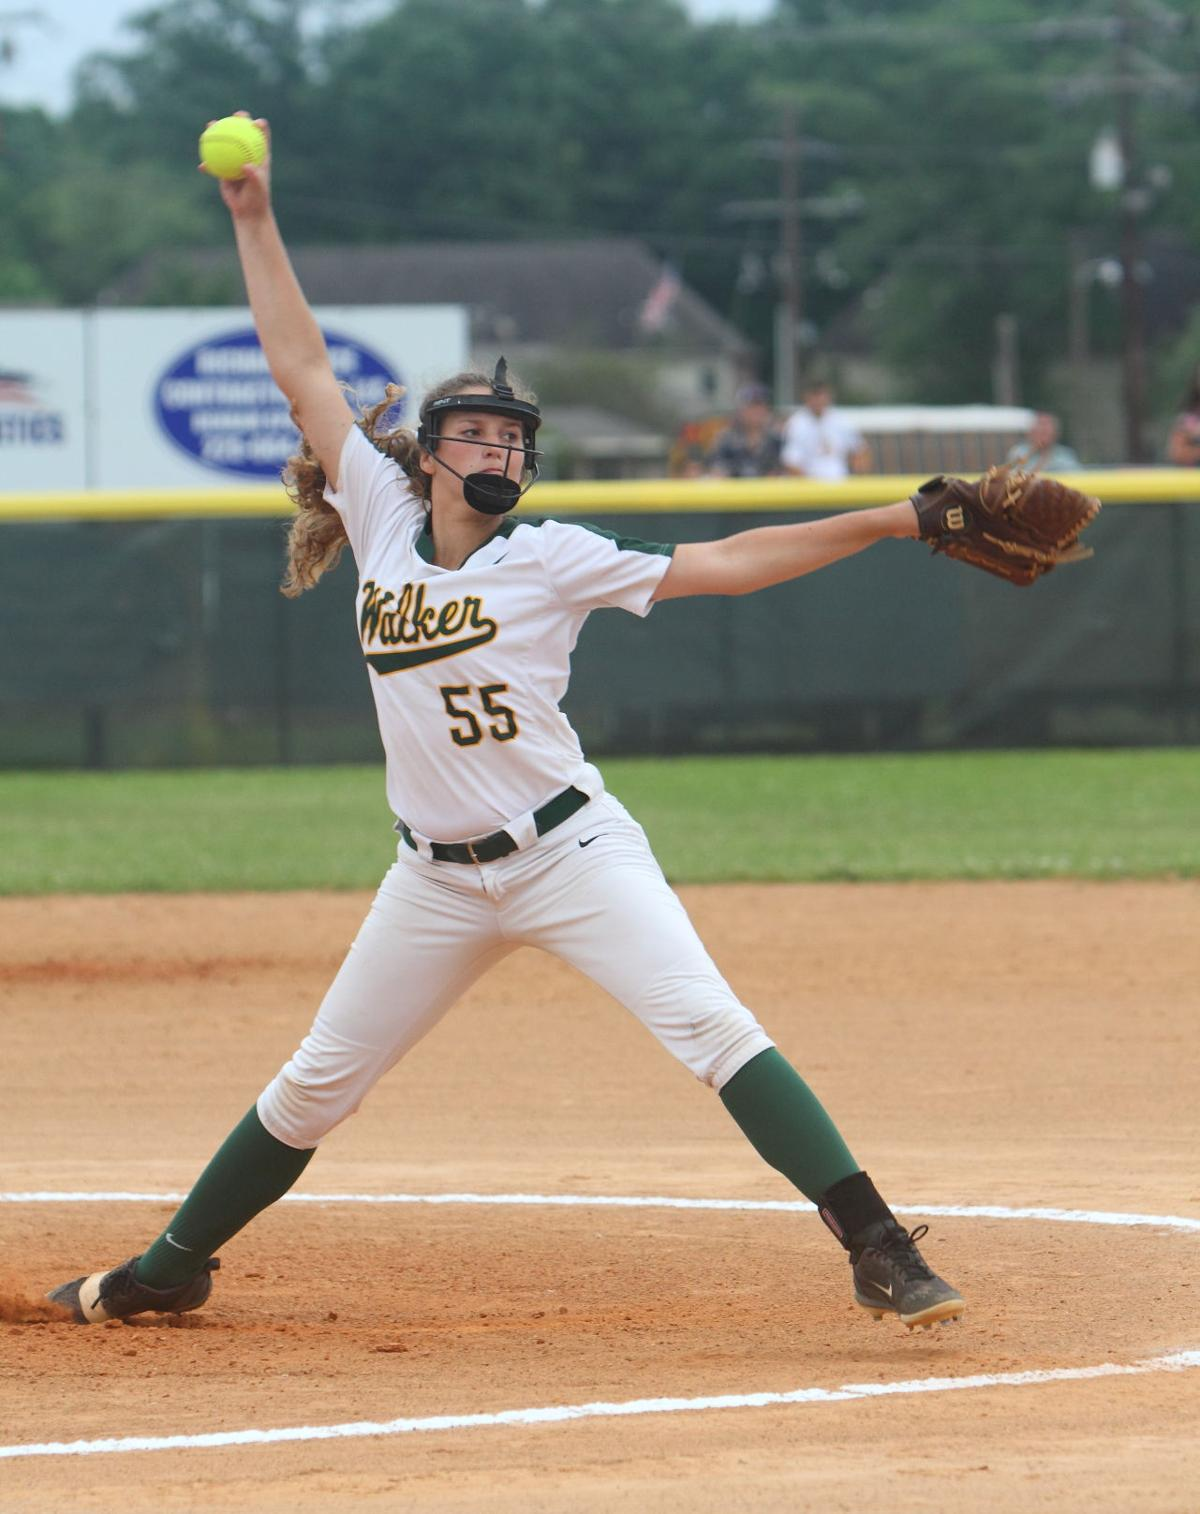 Walker-EA softball: Lainee Bailey